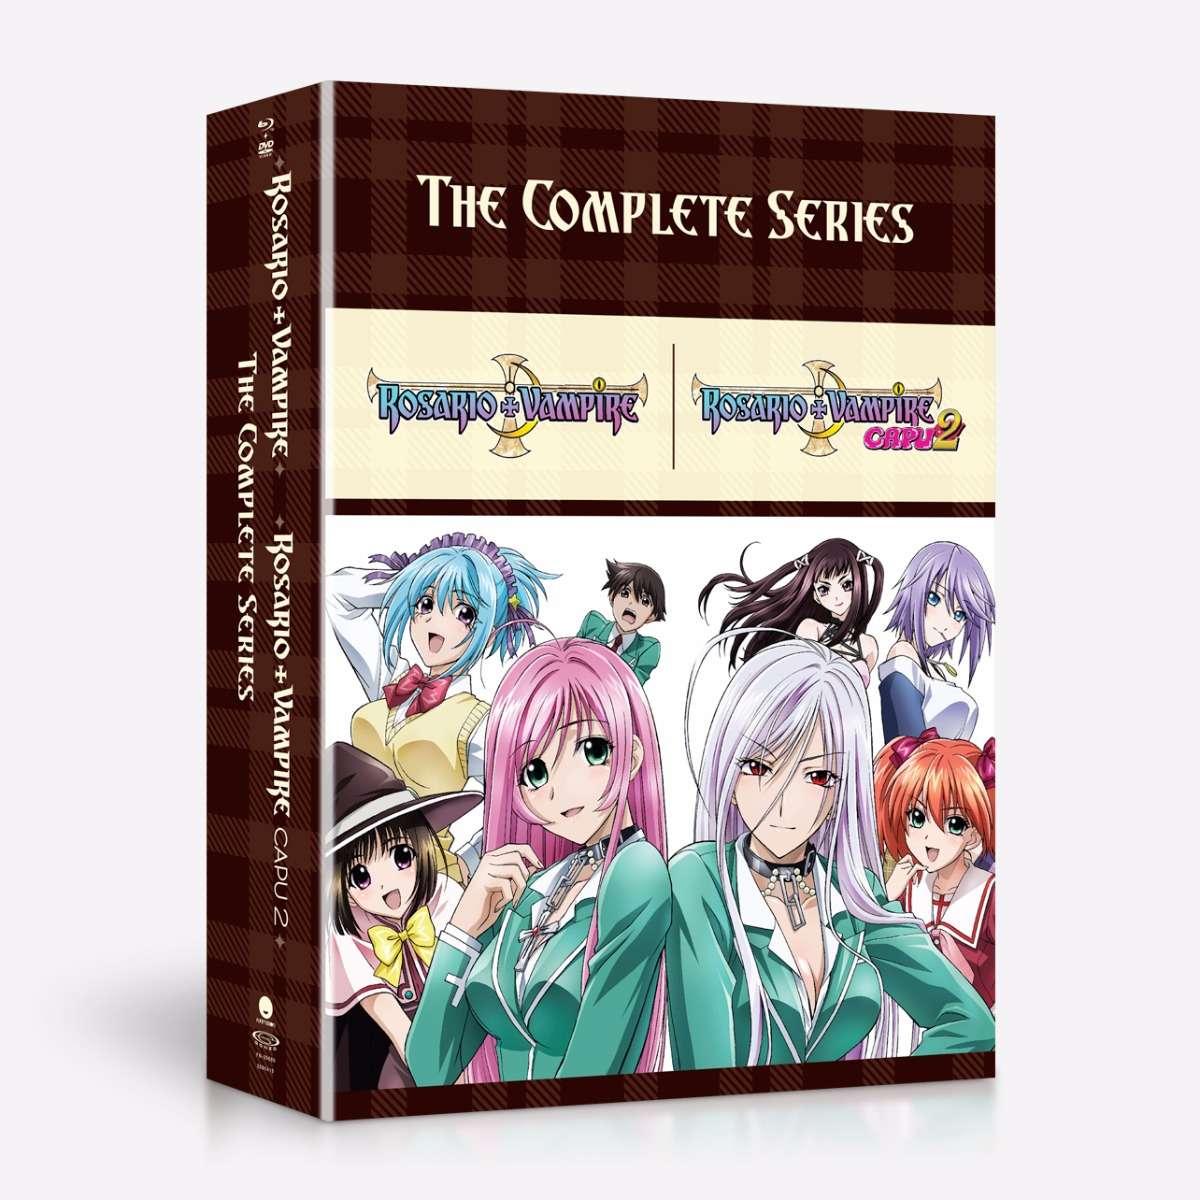 Rosario+Vampire Complete Series Blu-ray/DVD 704400096860